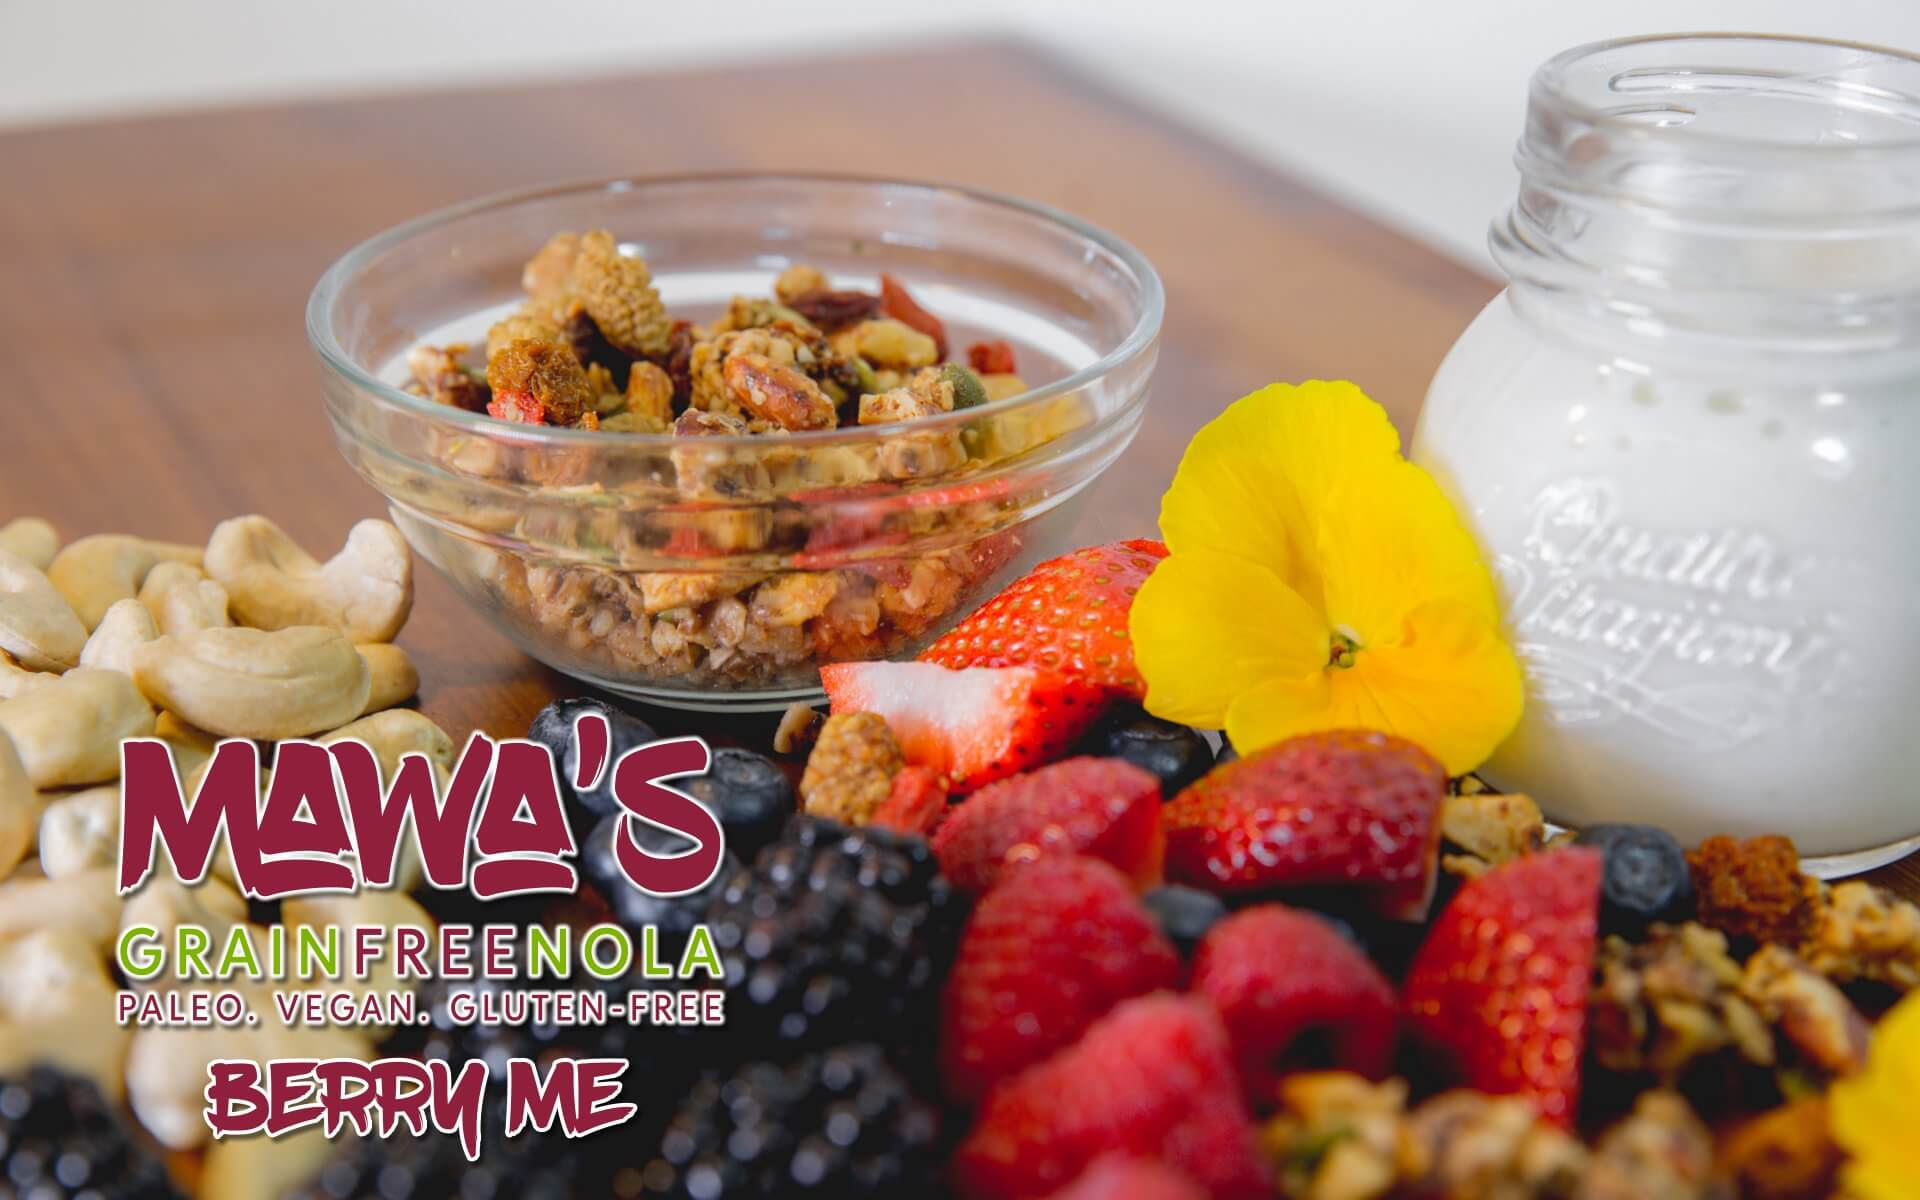 Mawa's GrainFreeNola - Berry Me Paleo, Vegan, Gluten-Free Granola